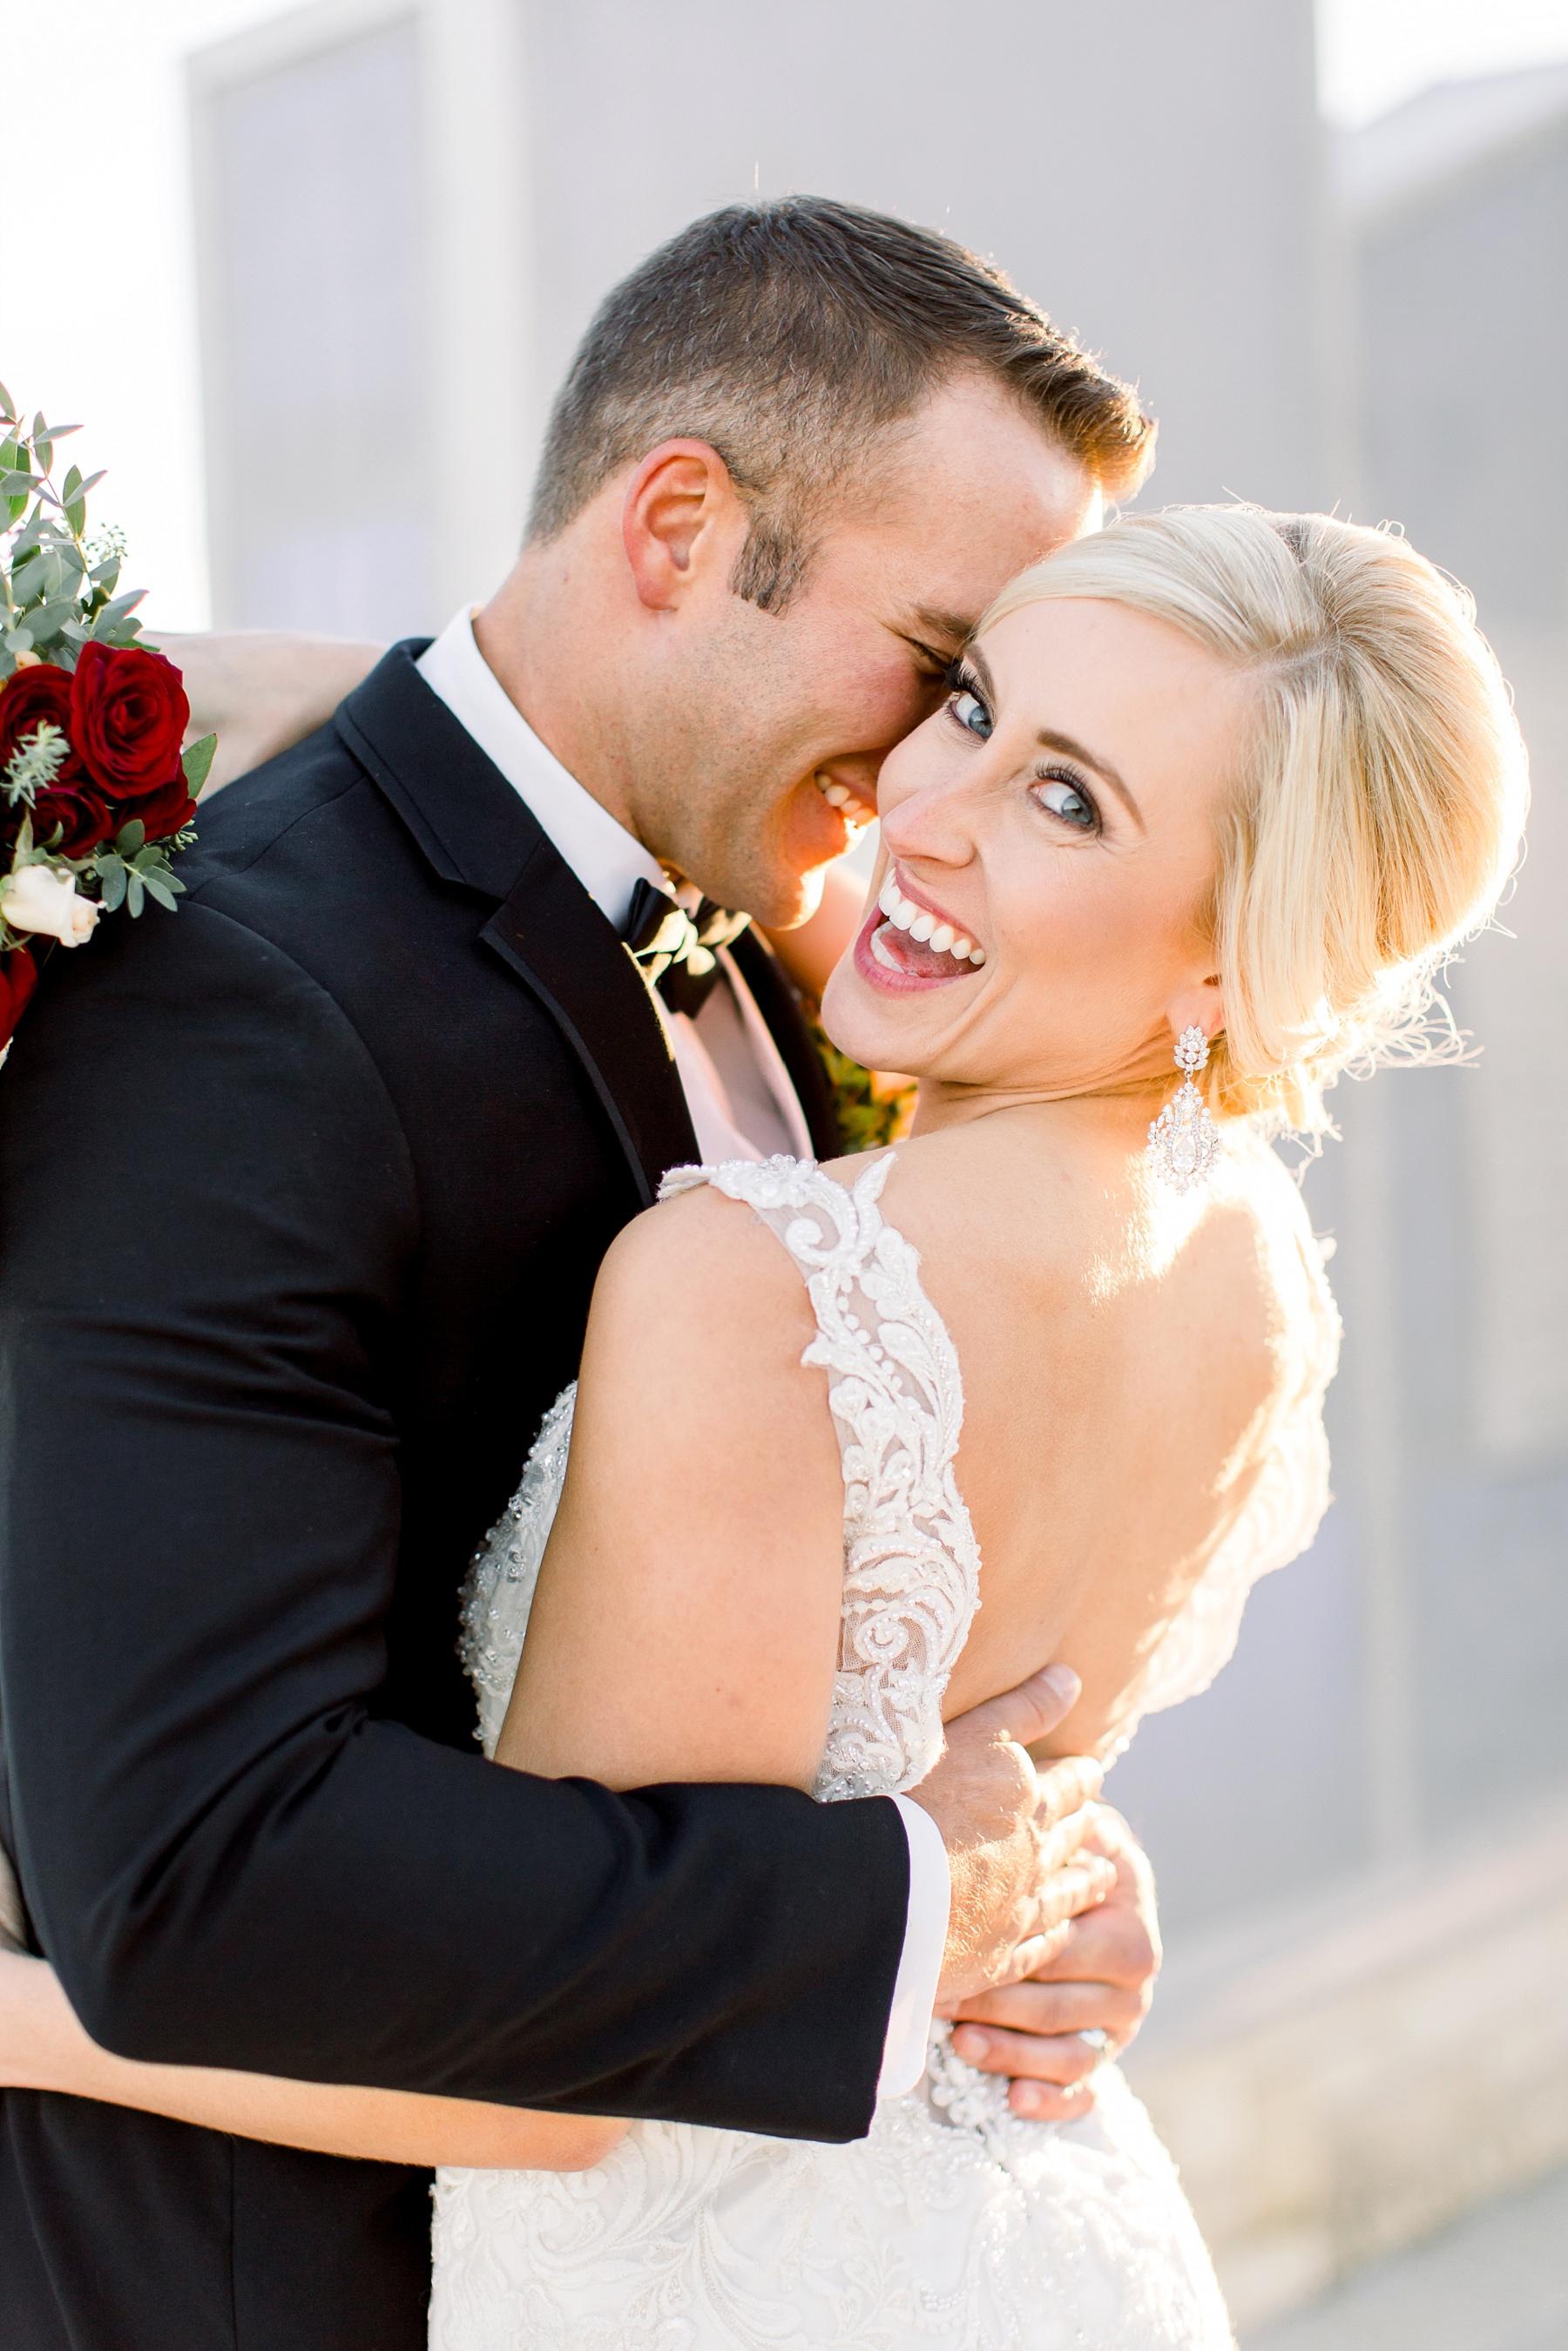 midwest-adventurous-wedding-photographer-elizabeth-ladean-photography-photo_4817.jpg